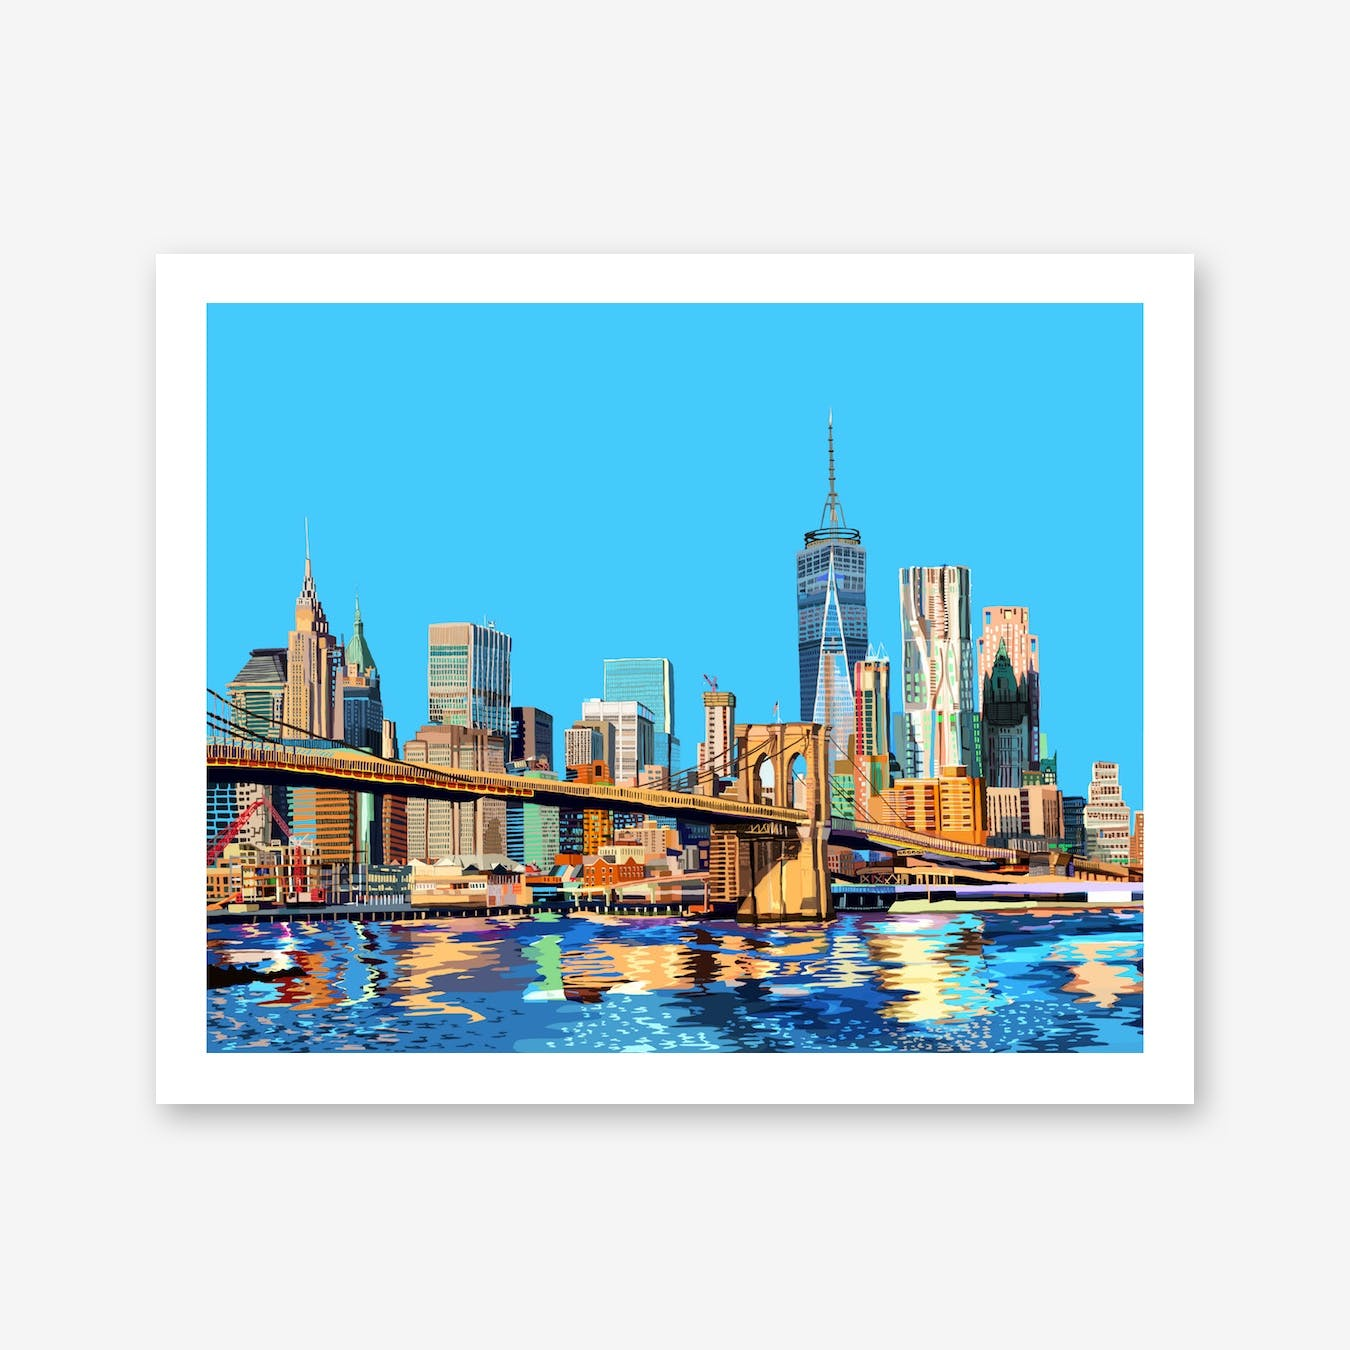 Brooklyn Bridge New York City A3 Print